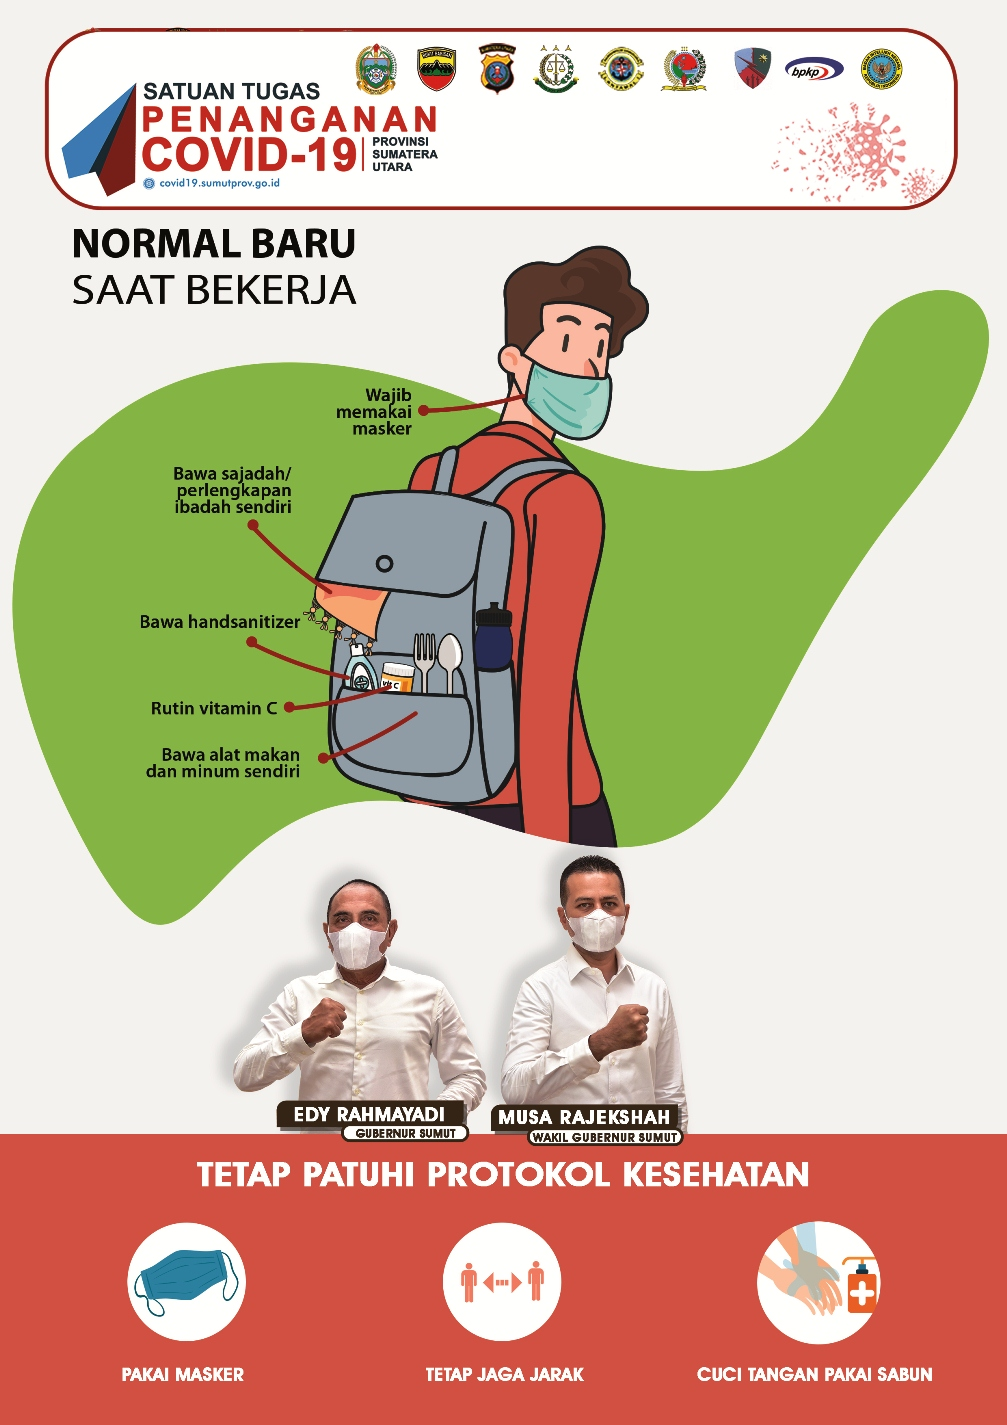 tetap patuhi protokol kesehatan